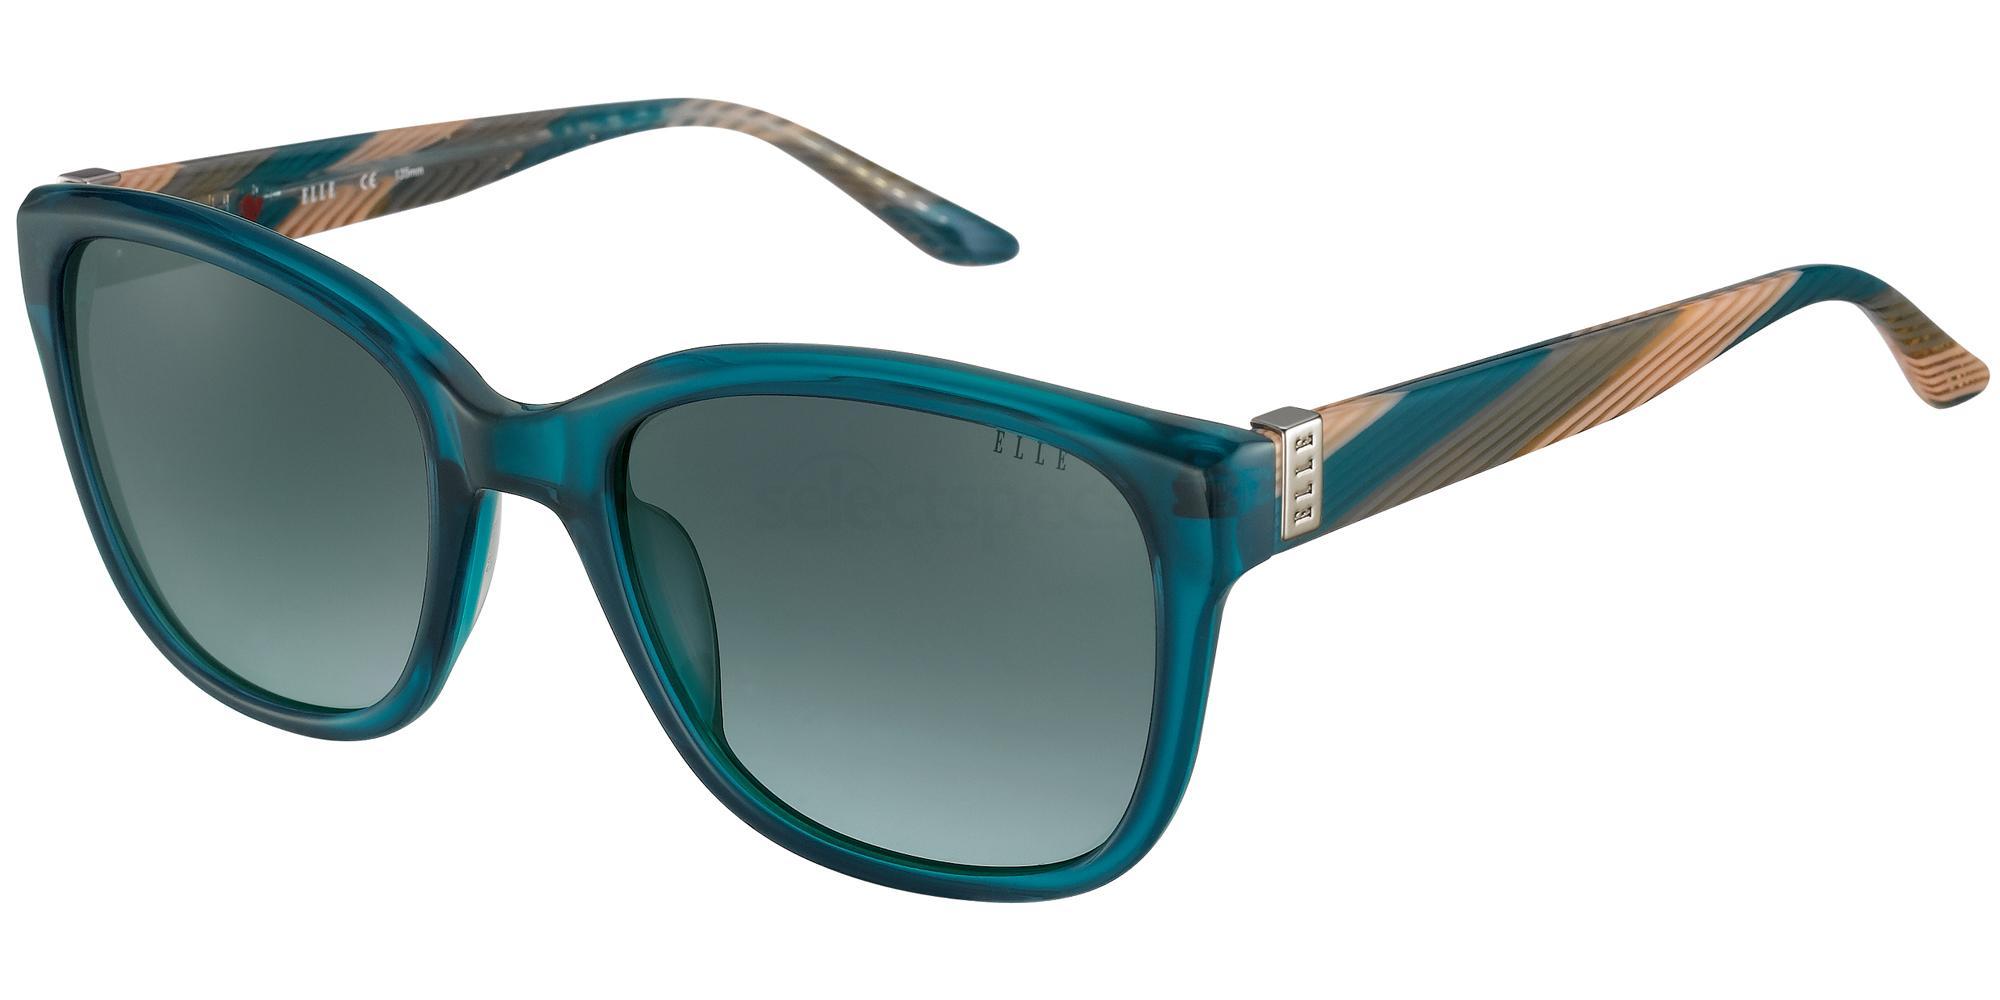 TU EL14824 Sunglasses, ELLE